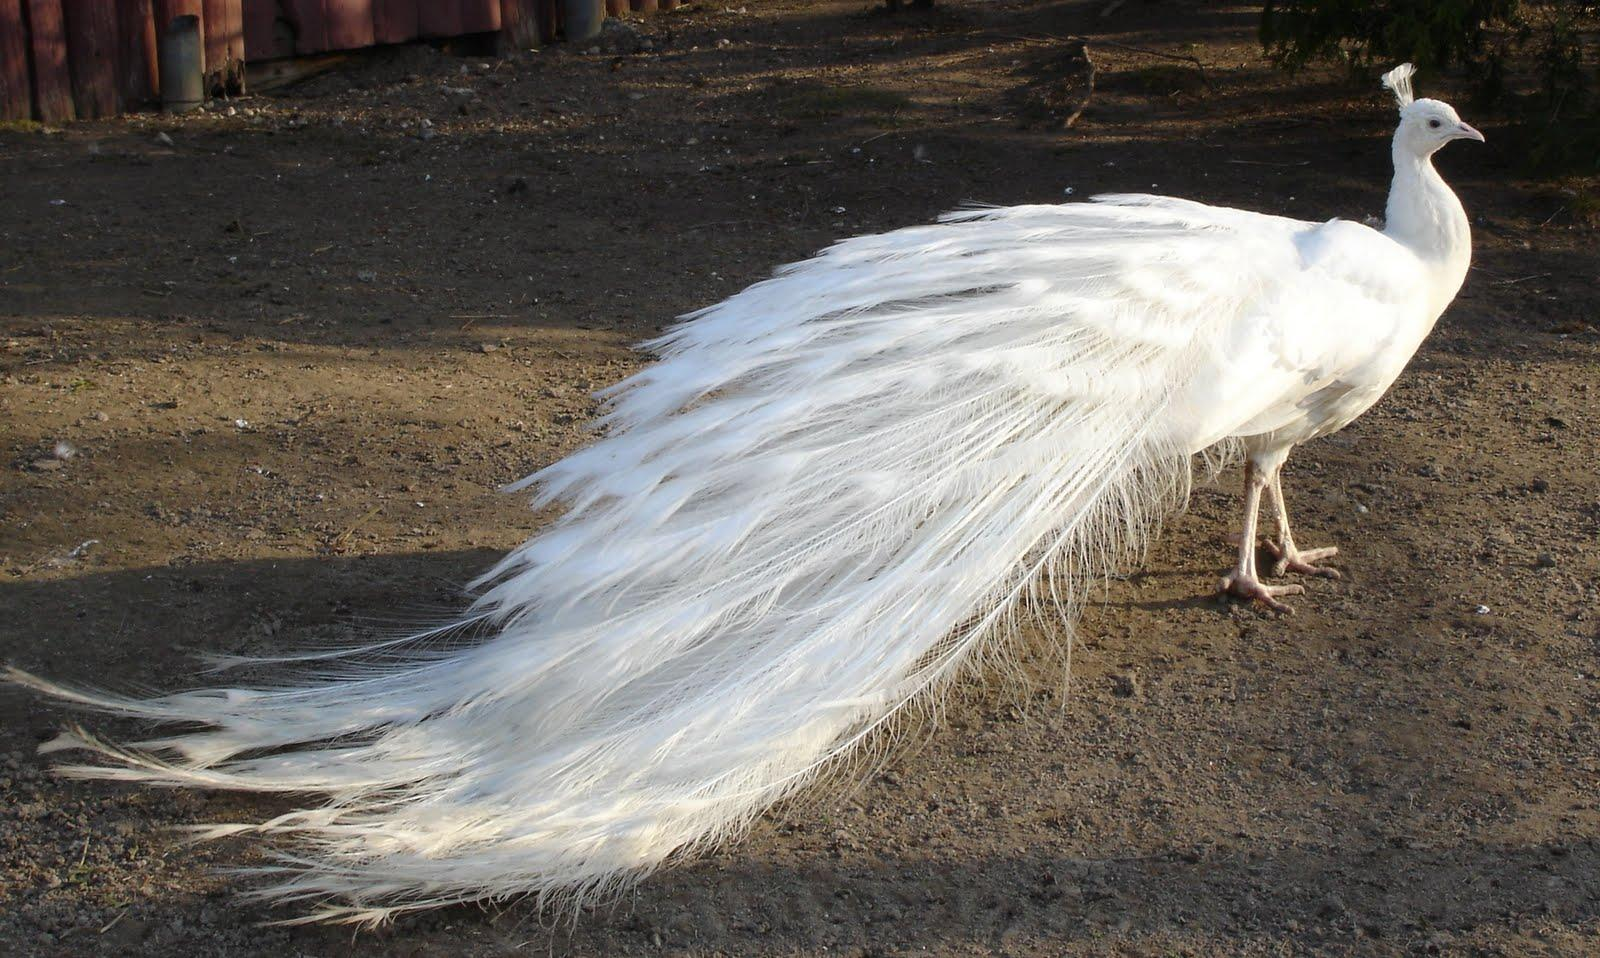 White peacock dress - photo#24